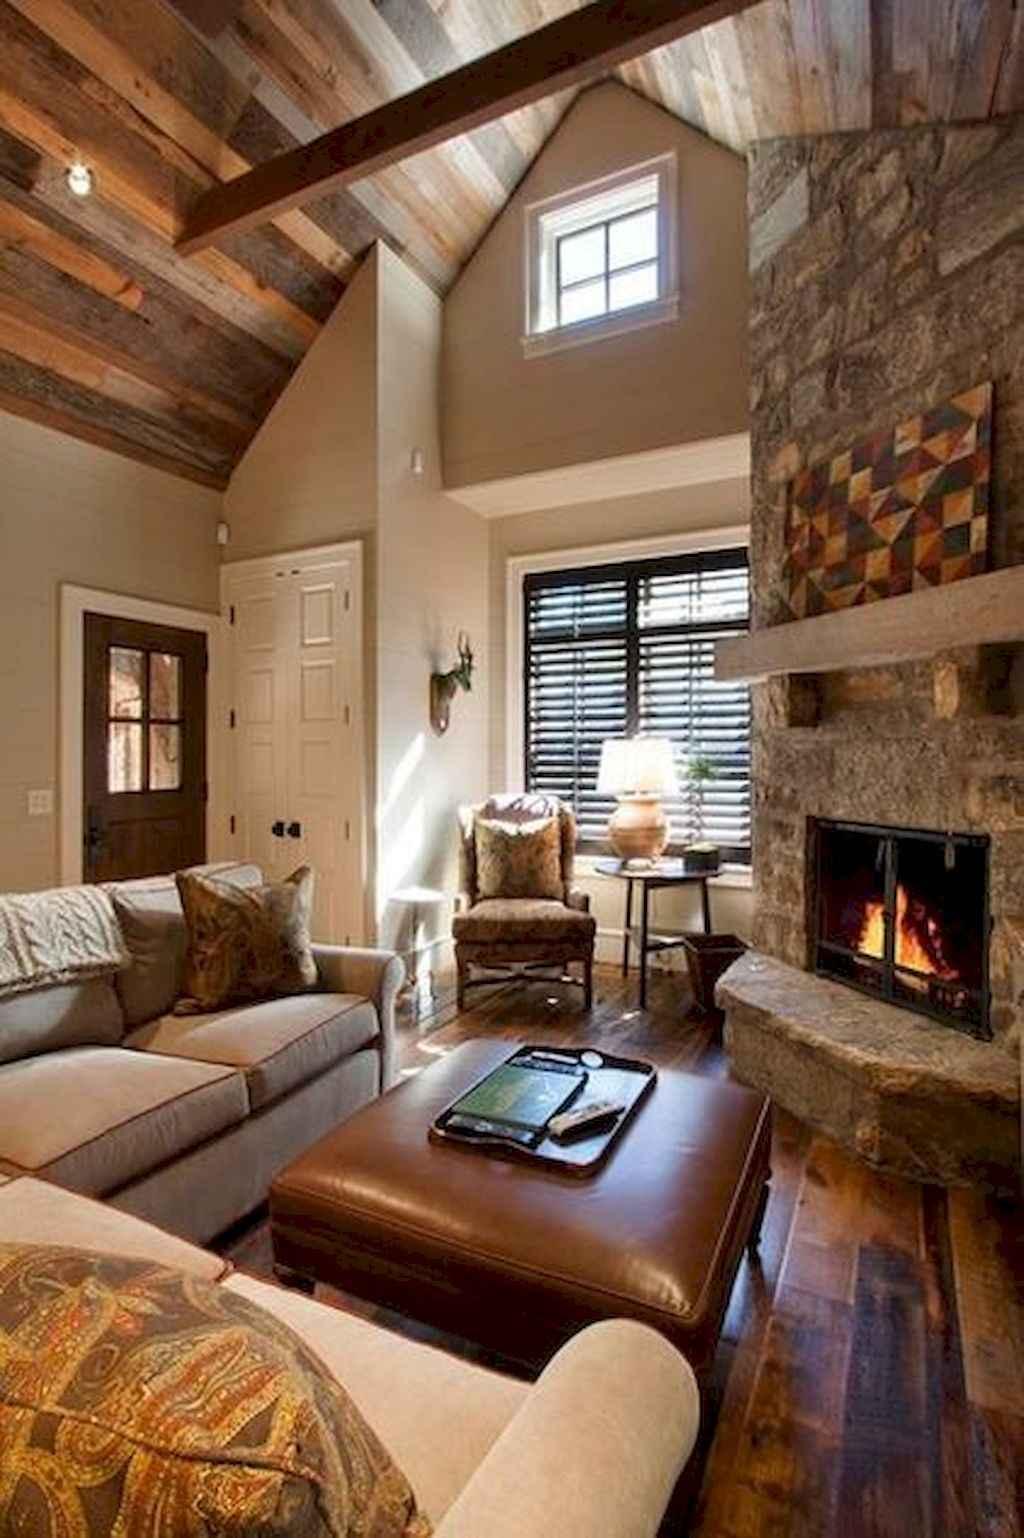 captivating cozy modern living room ideas   44 cozy modern farmhouse living room decor ideas ...